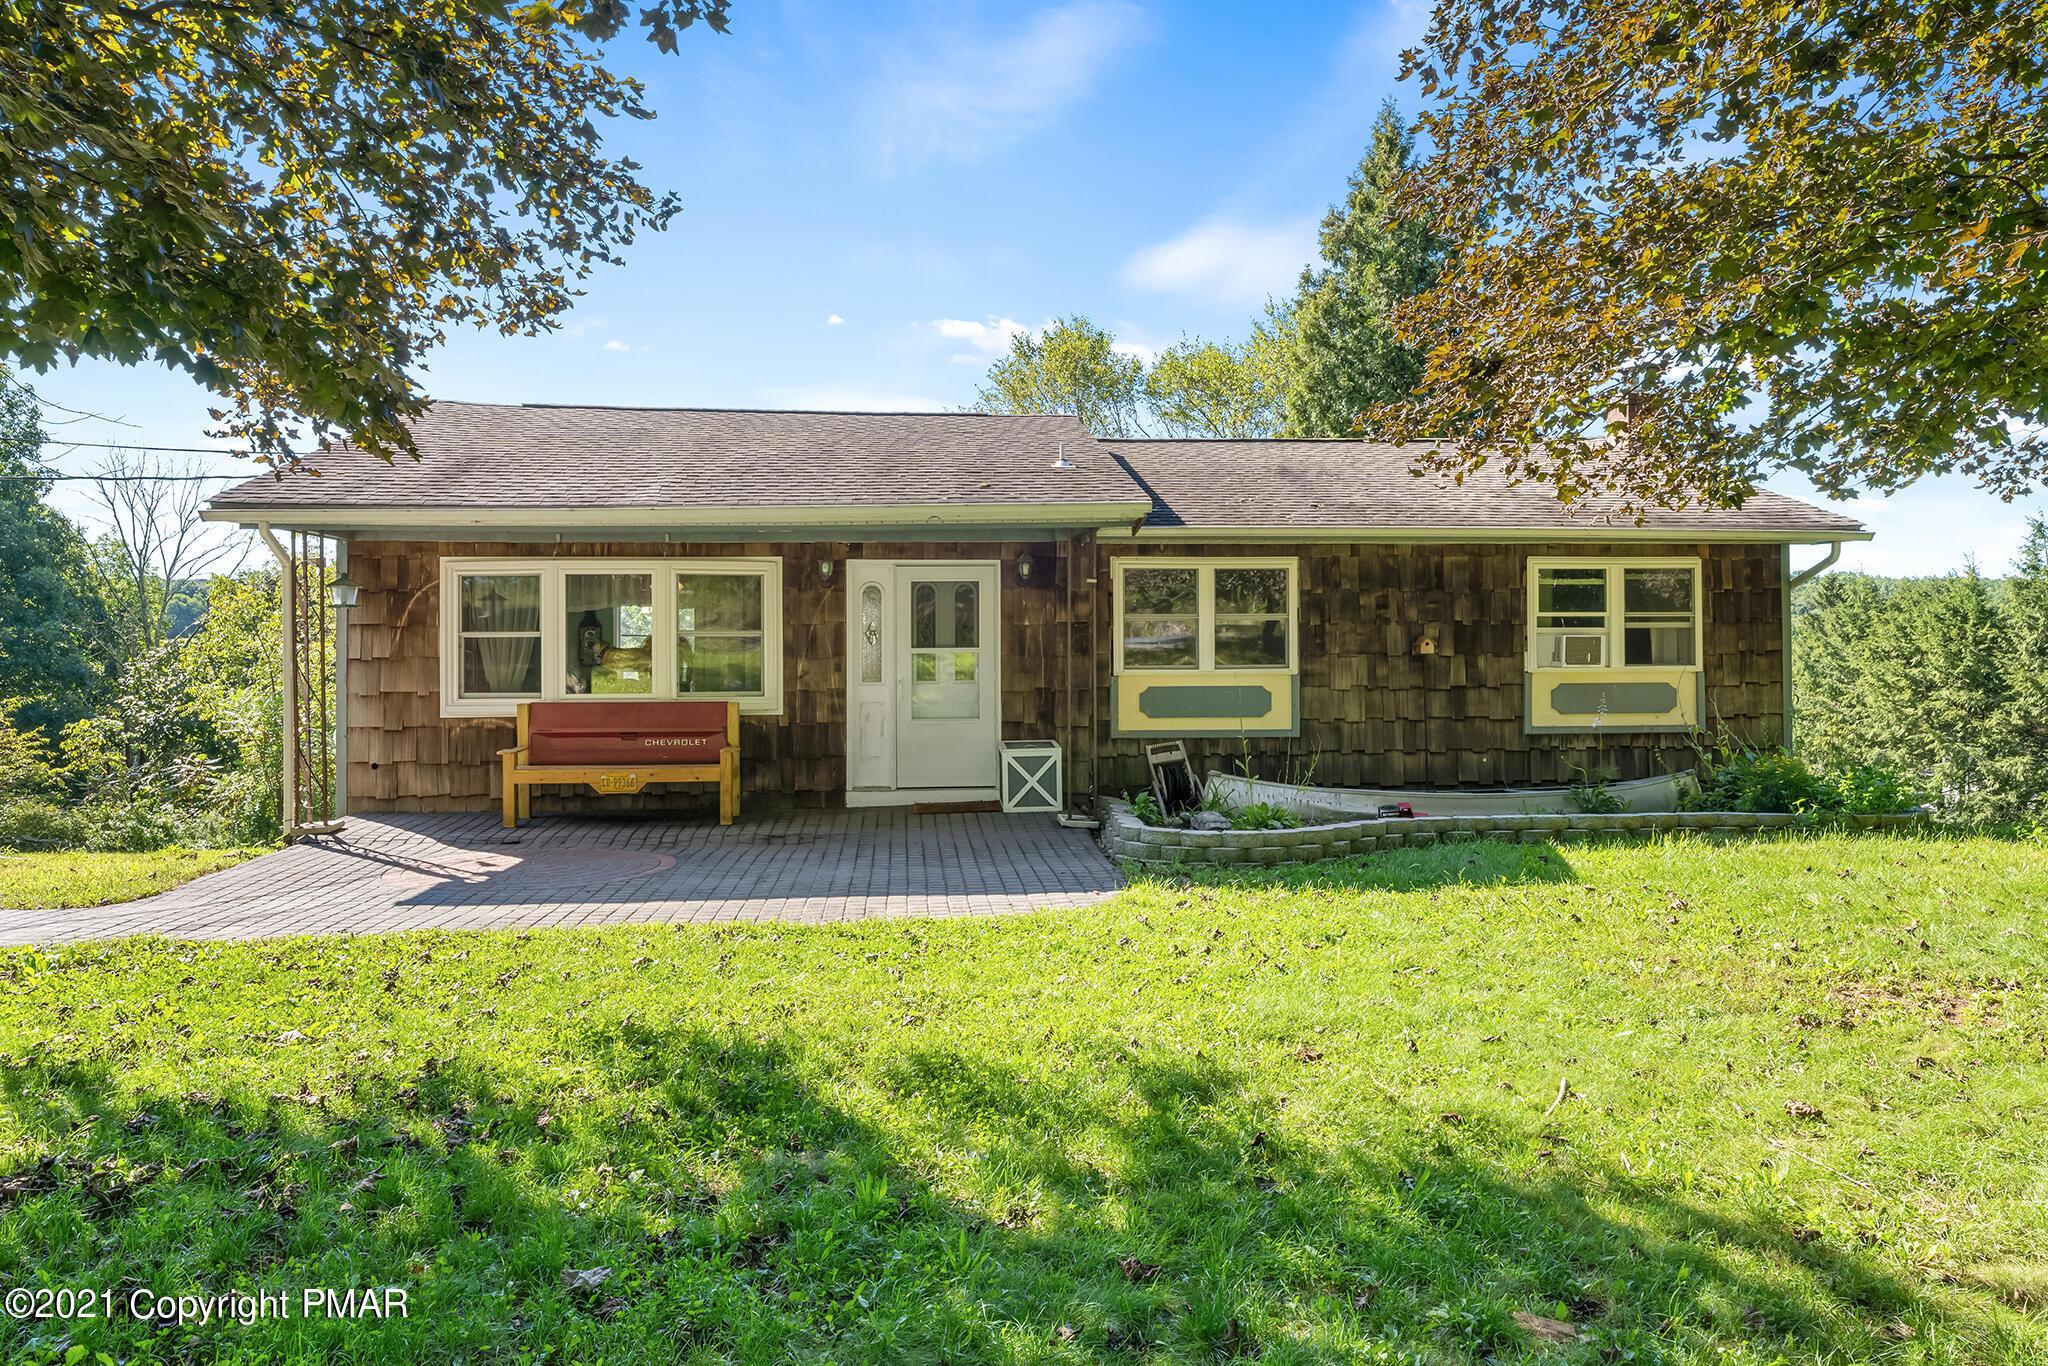 413 Stony Brook Dr, Stroudsburg, PA 18360